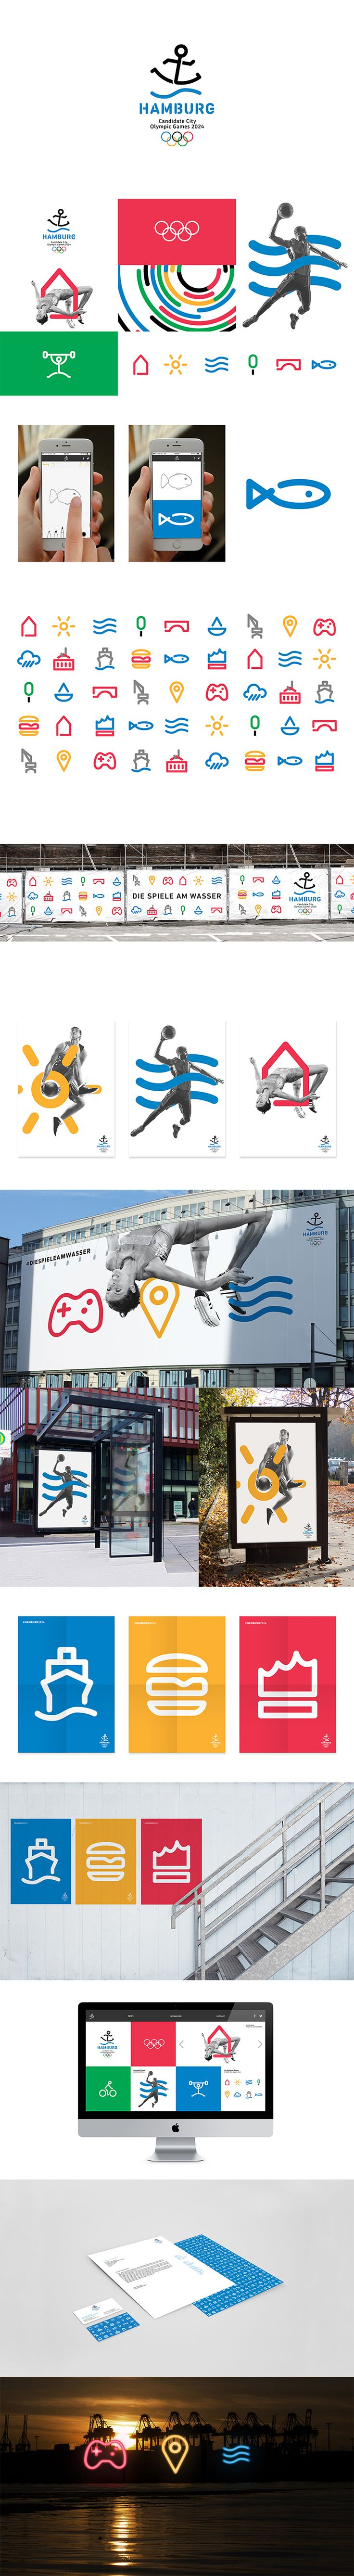 HAMBURG2024 CORPORATE DESIGN CONCEPT FOR THE 2024 OLYMPIC GAMES CANDIDACY OF HAMBURG  Copyright 2016  https://brandprototyping.de/2016/05/09/logo_hamburg2024_anchorman/